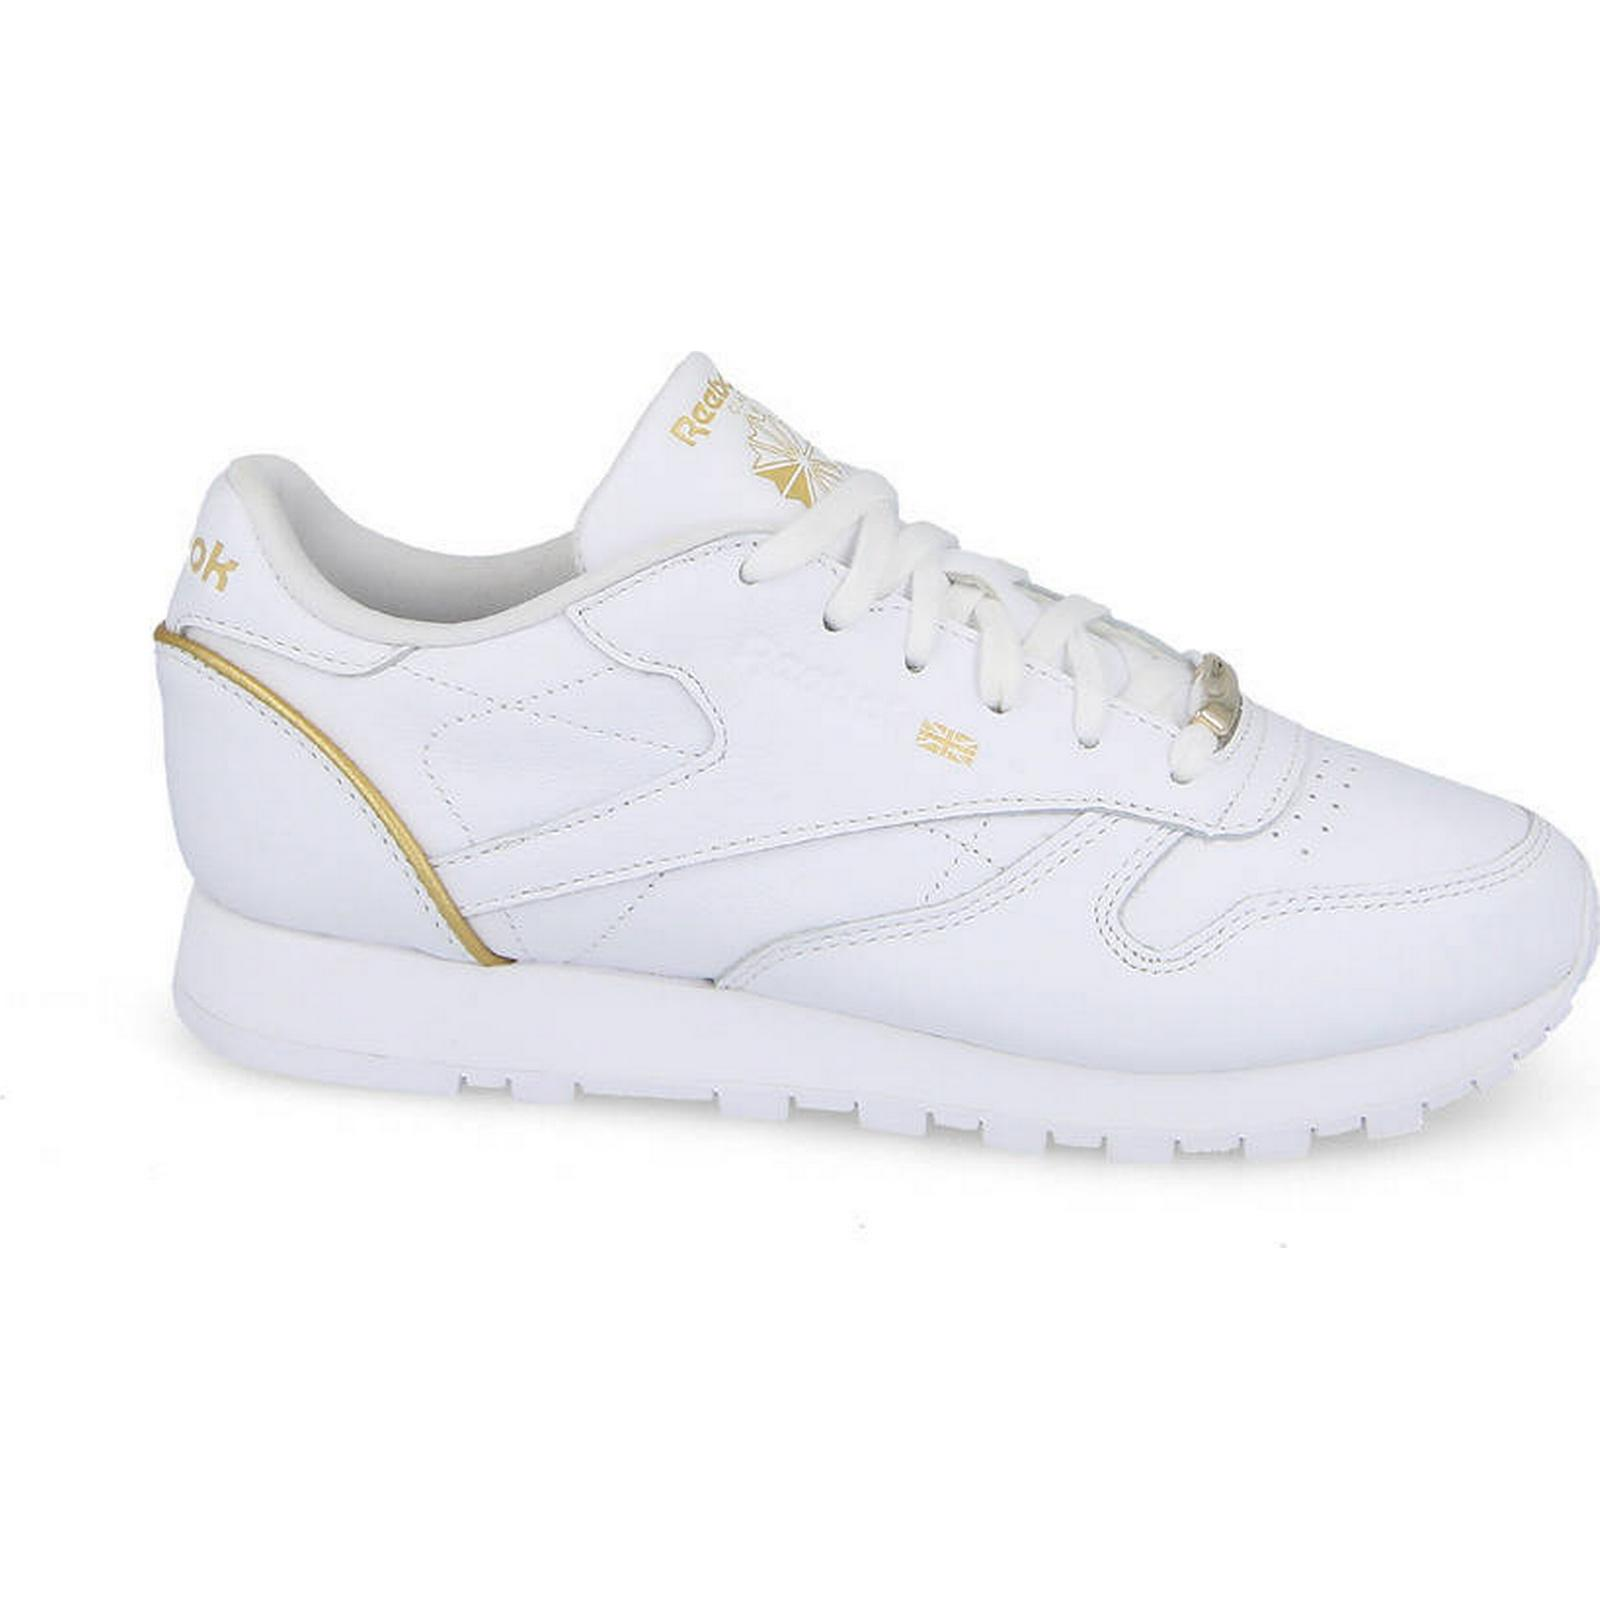 Reebok Hw Classic Women's Shoes sneakers Reebok Classic Leather Hw Reebok BS9878 WHITE Size 38 e8e667